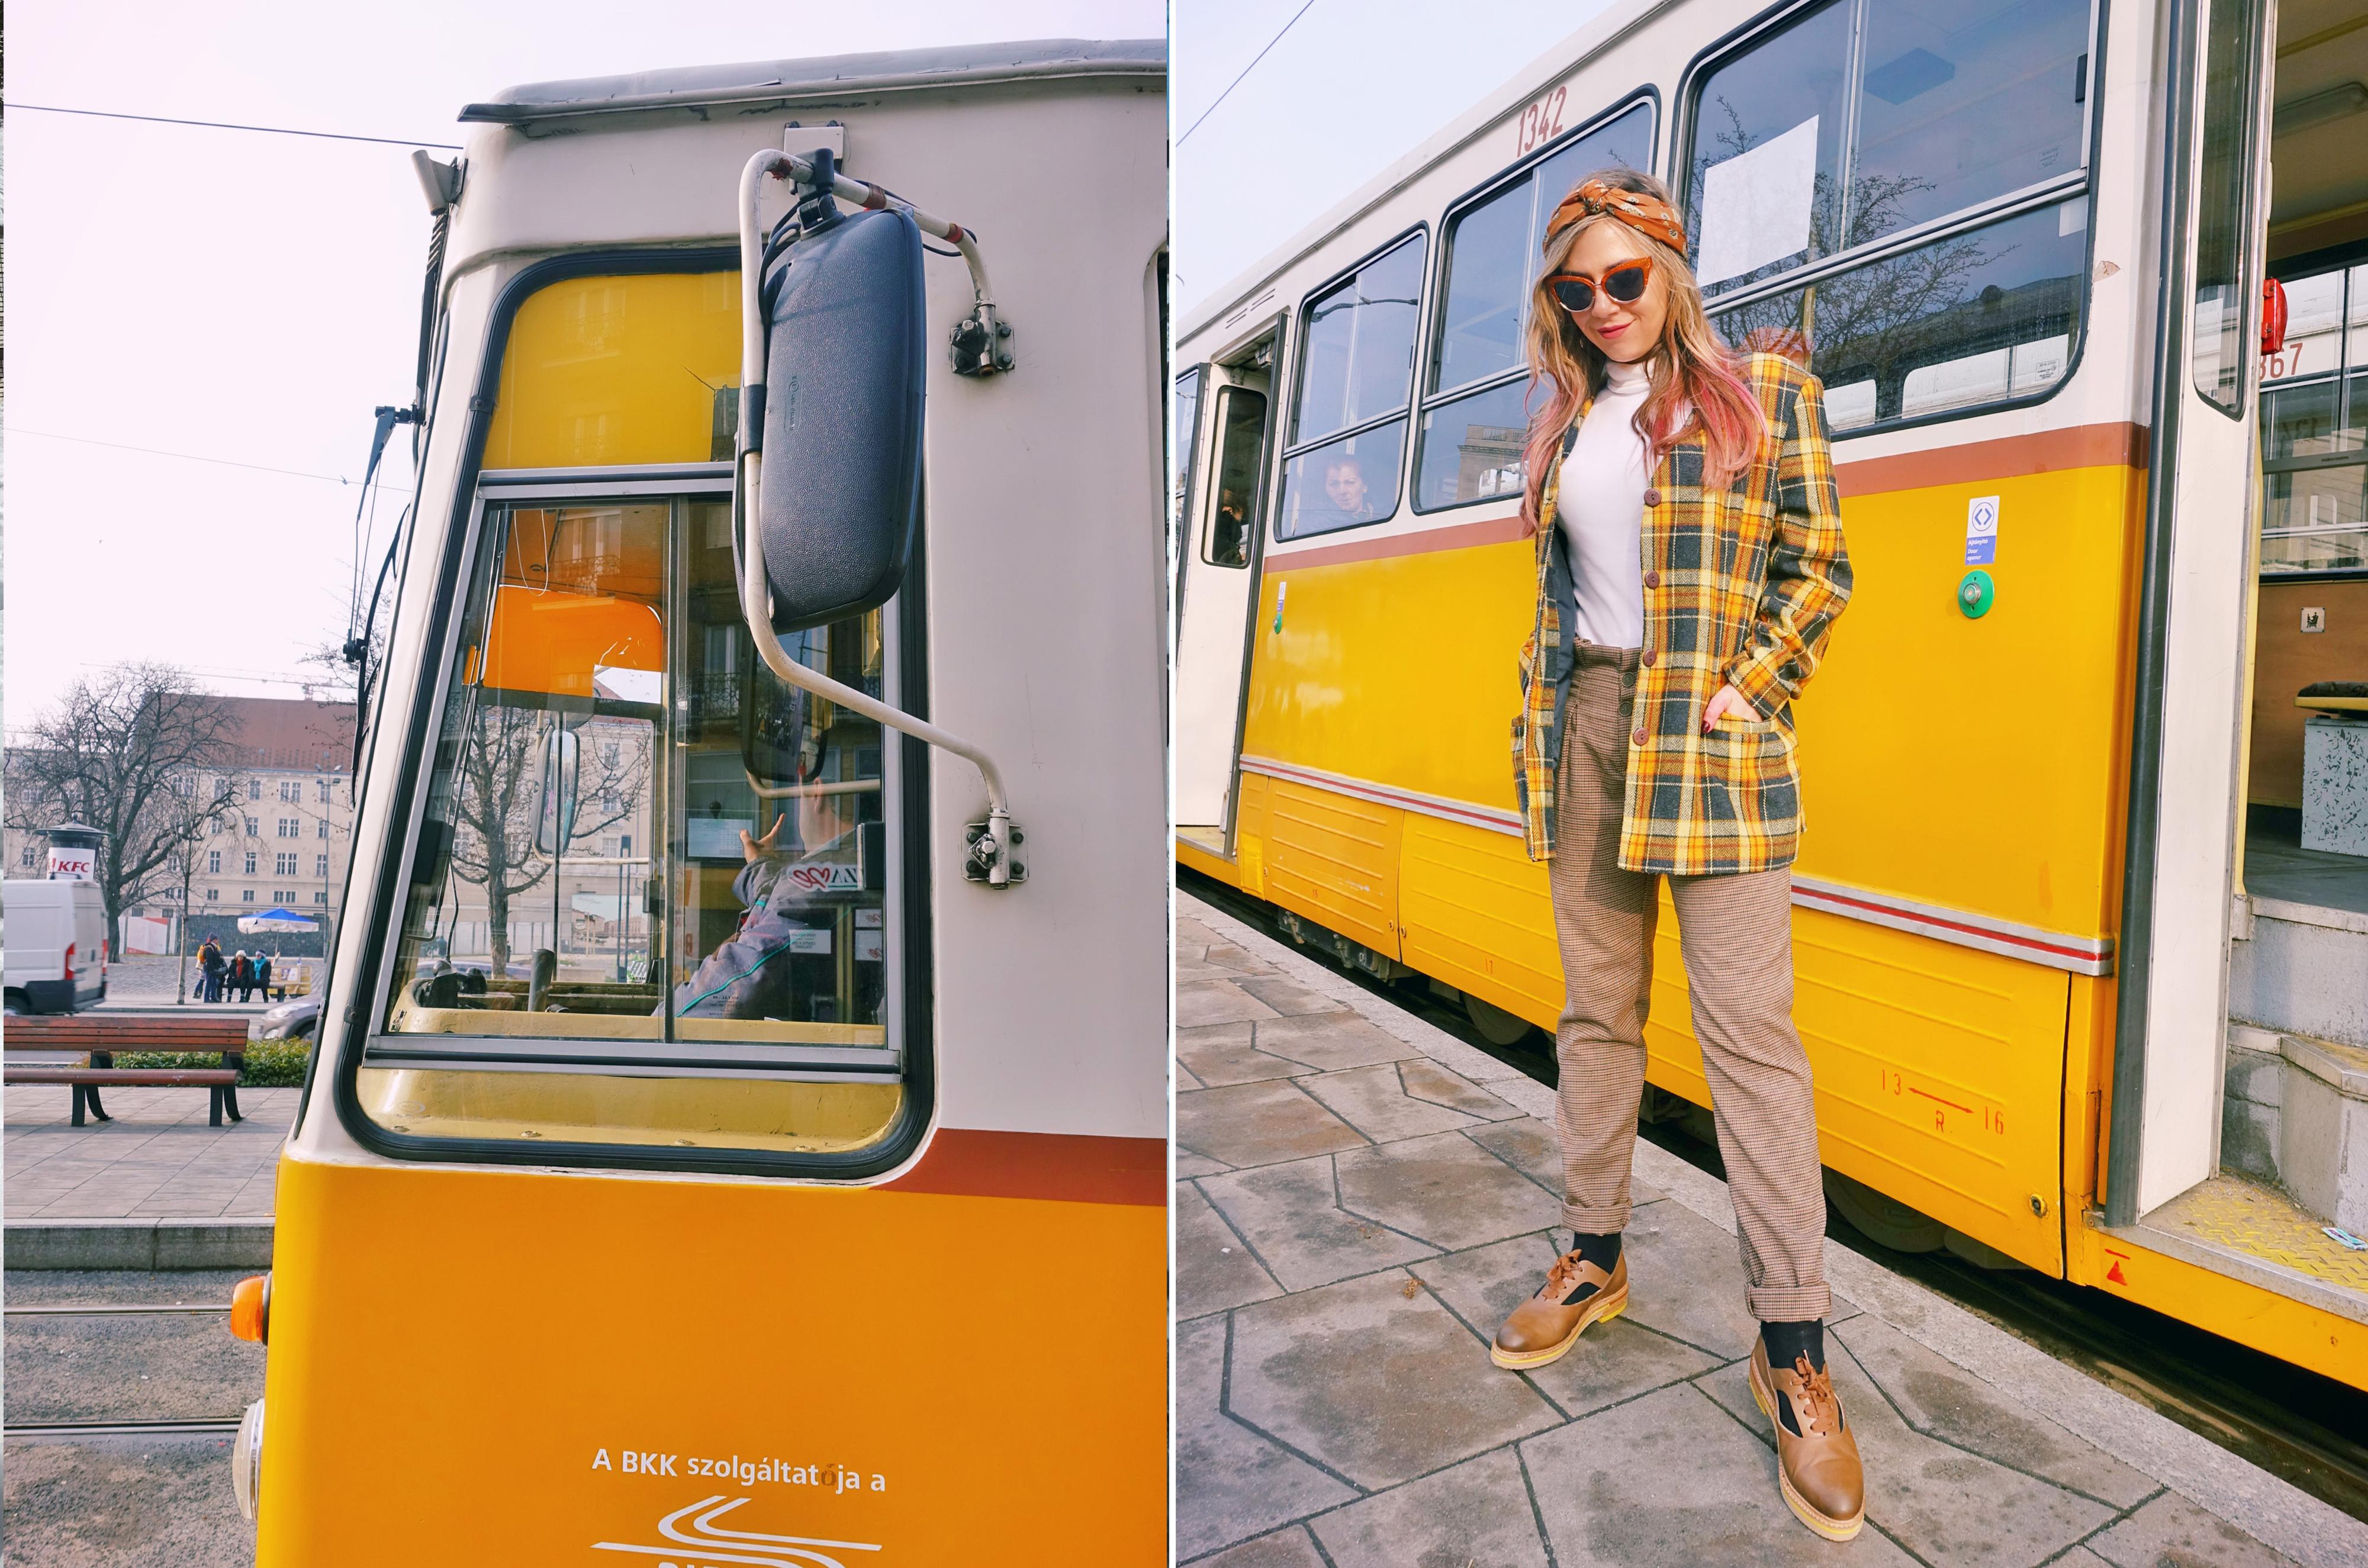 Fashionista-blazer-de-cuadros-ChicAdicta-blog-de-moda-Chic-Adicta-influencer-oxford-shoes-Budapest-street-style-PiensaenChic-Piensa-en-Chic